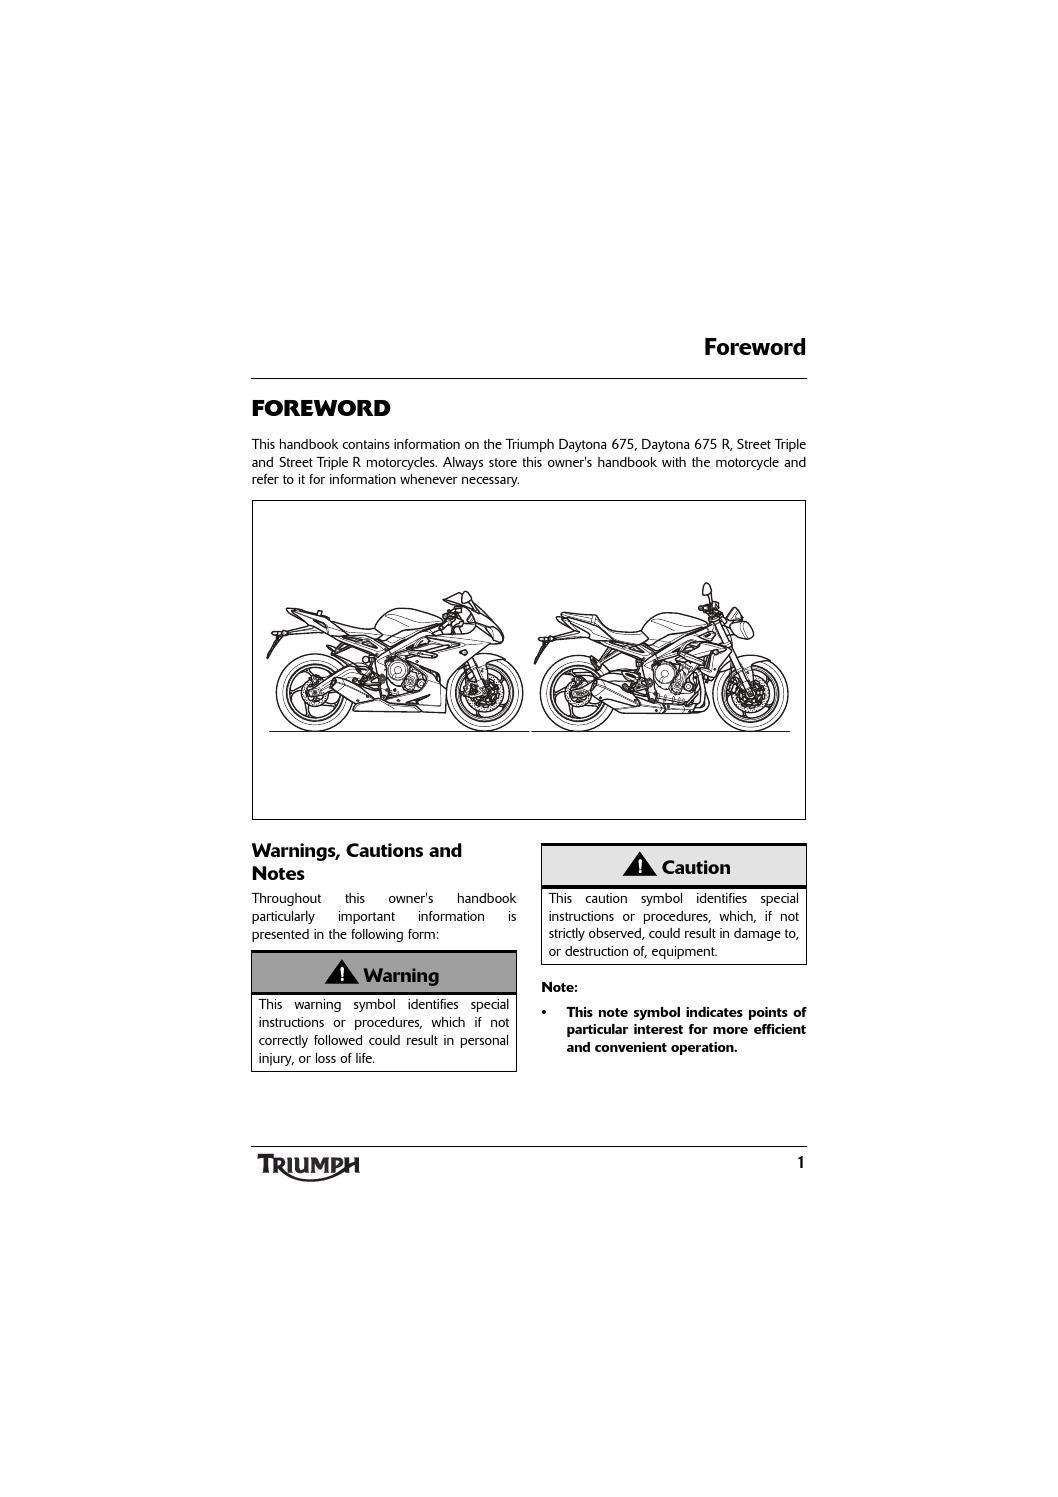 Owner's Manual - Triumph Street Triple ABS by Mototainment | Ducati Triumph  New York - issuu